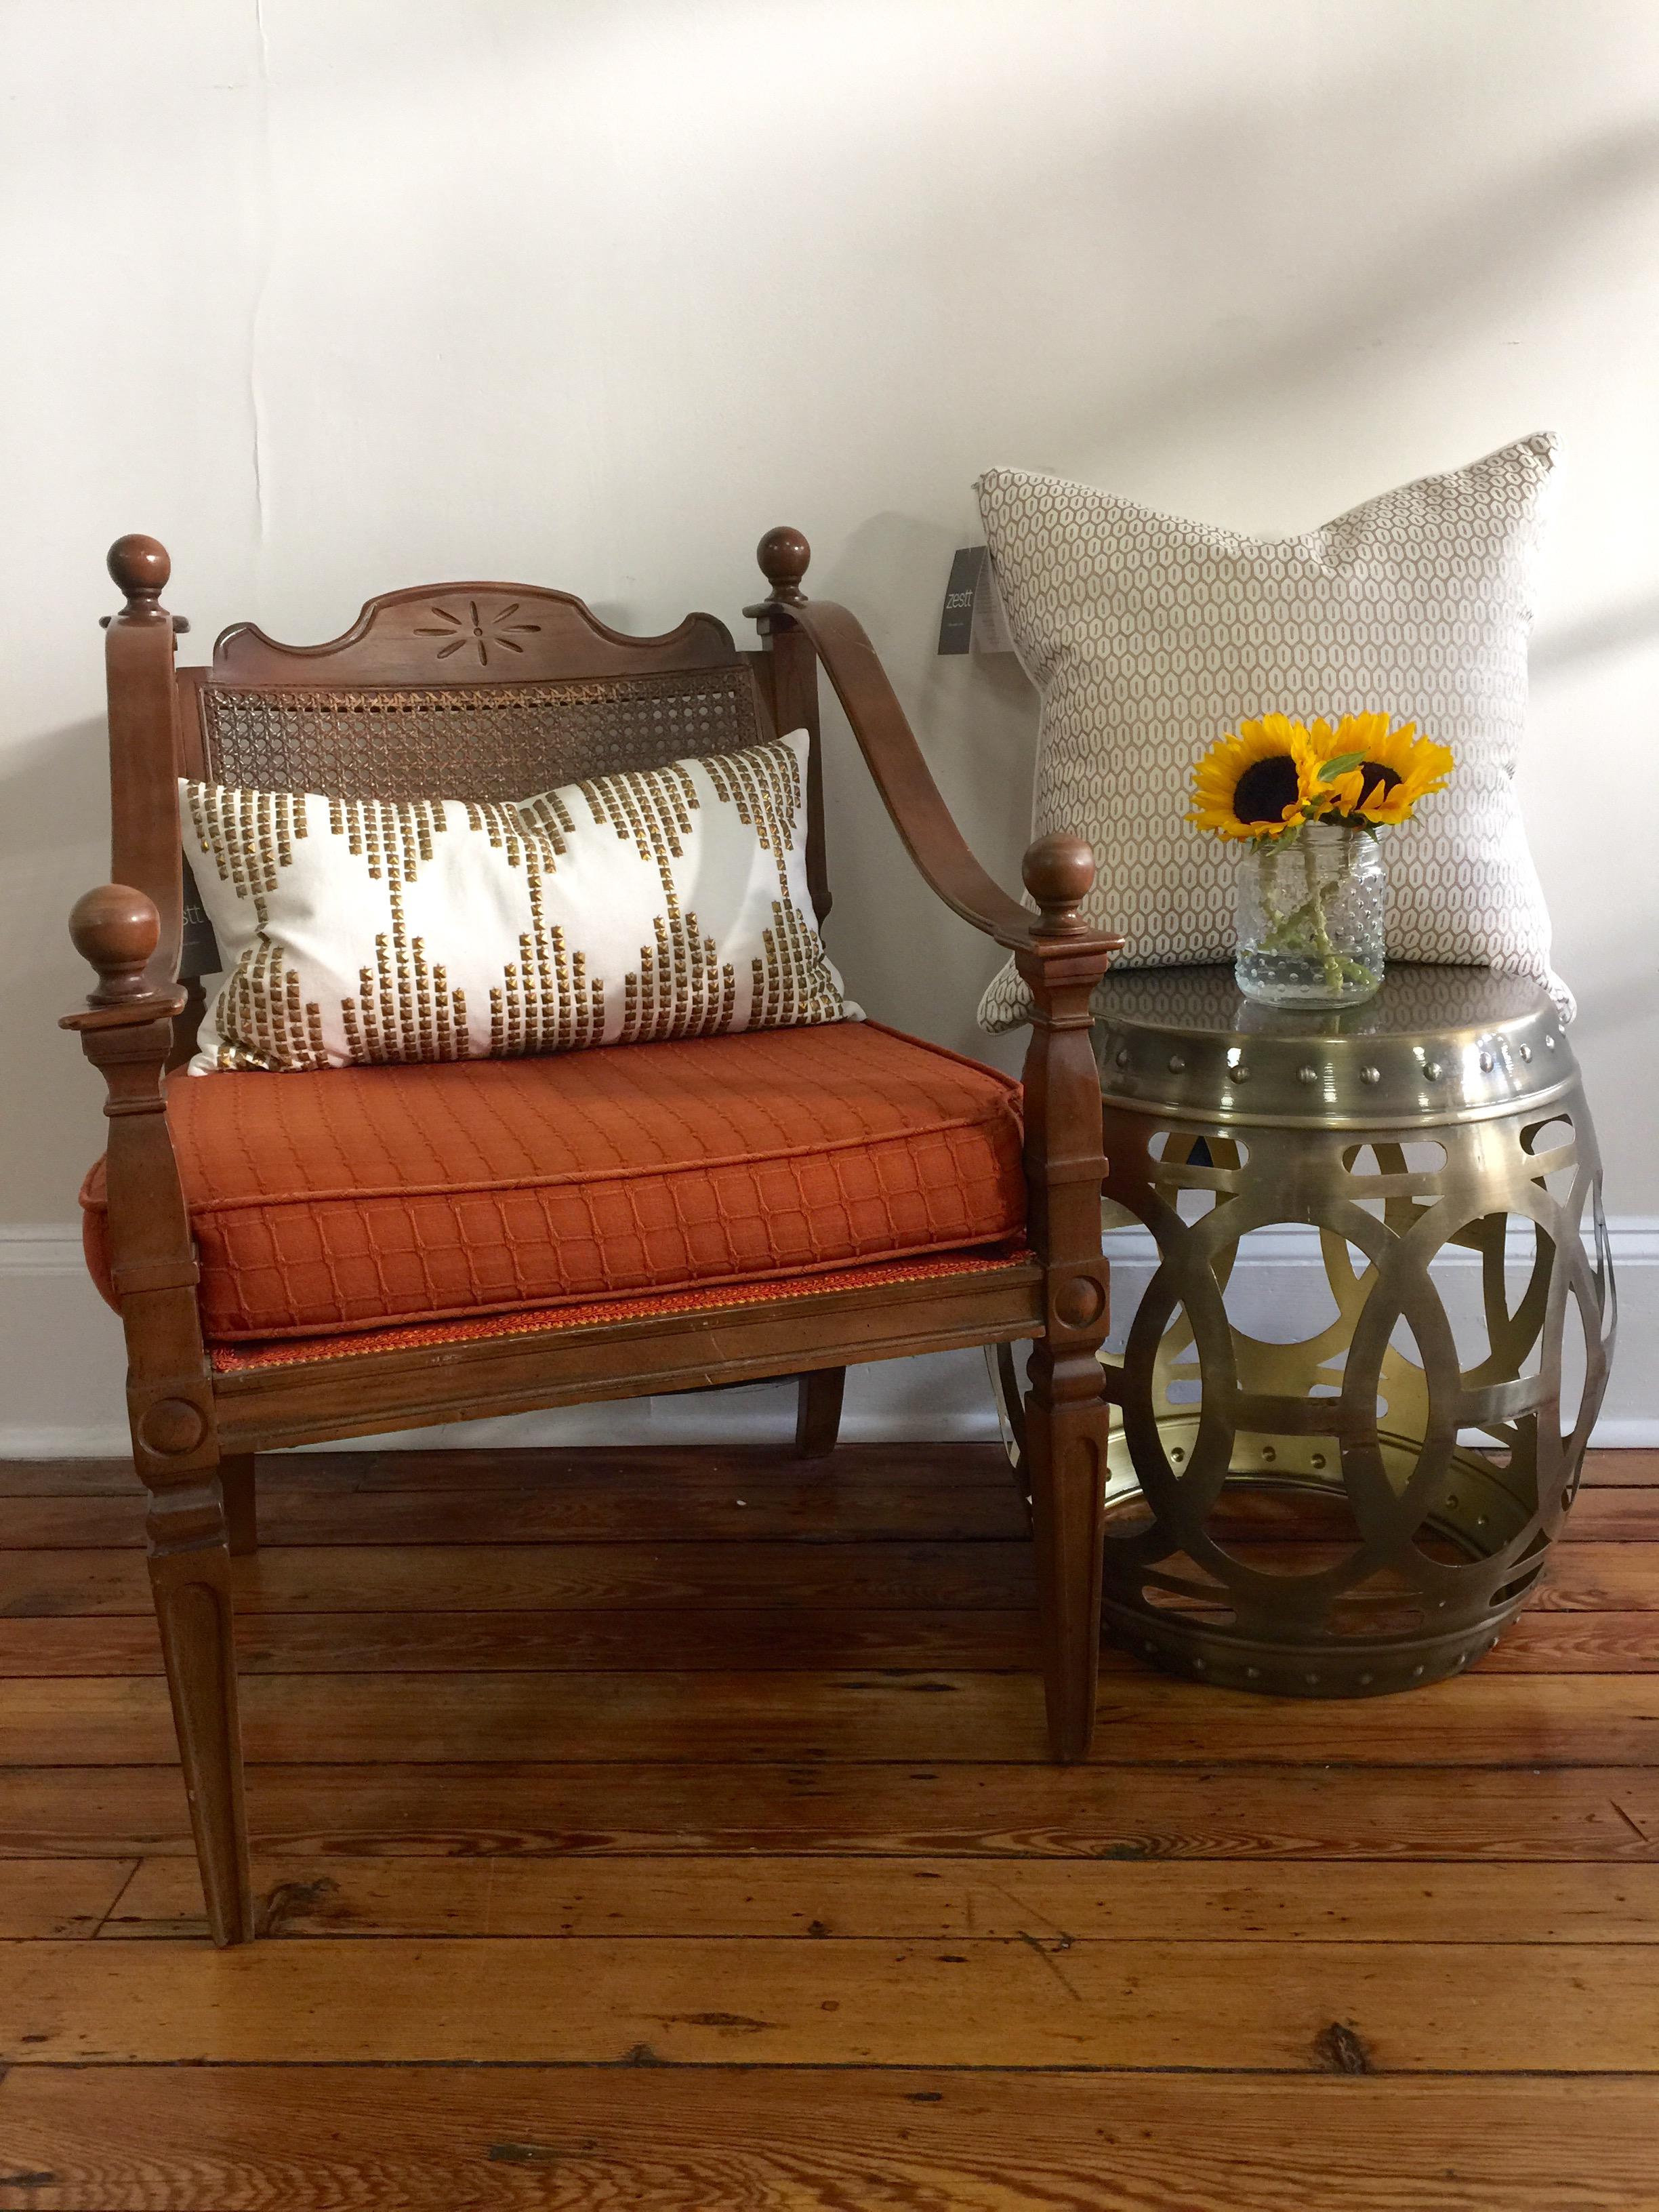 Pineapple Main — Harris & Tweed Interiors